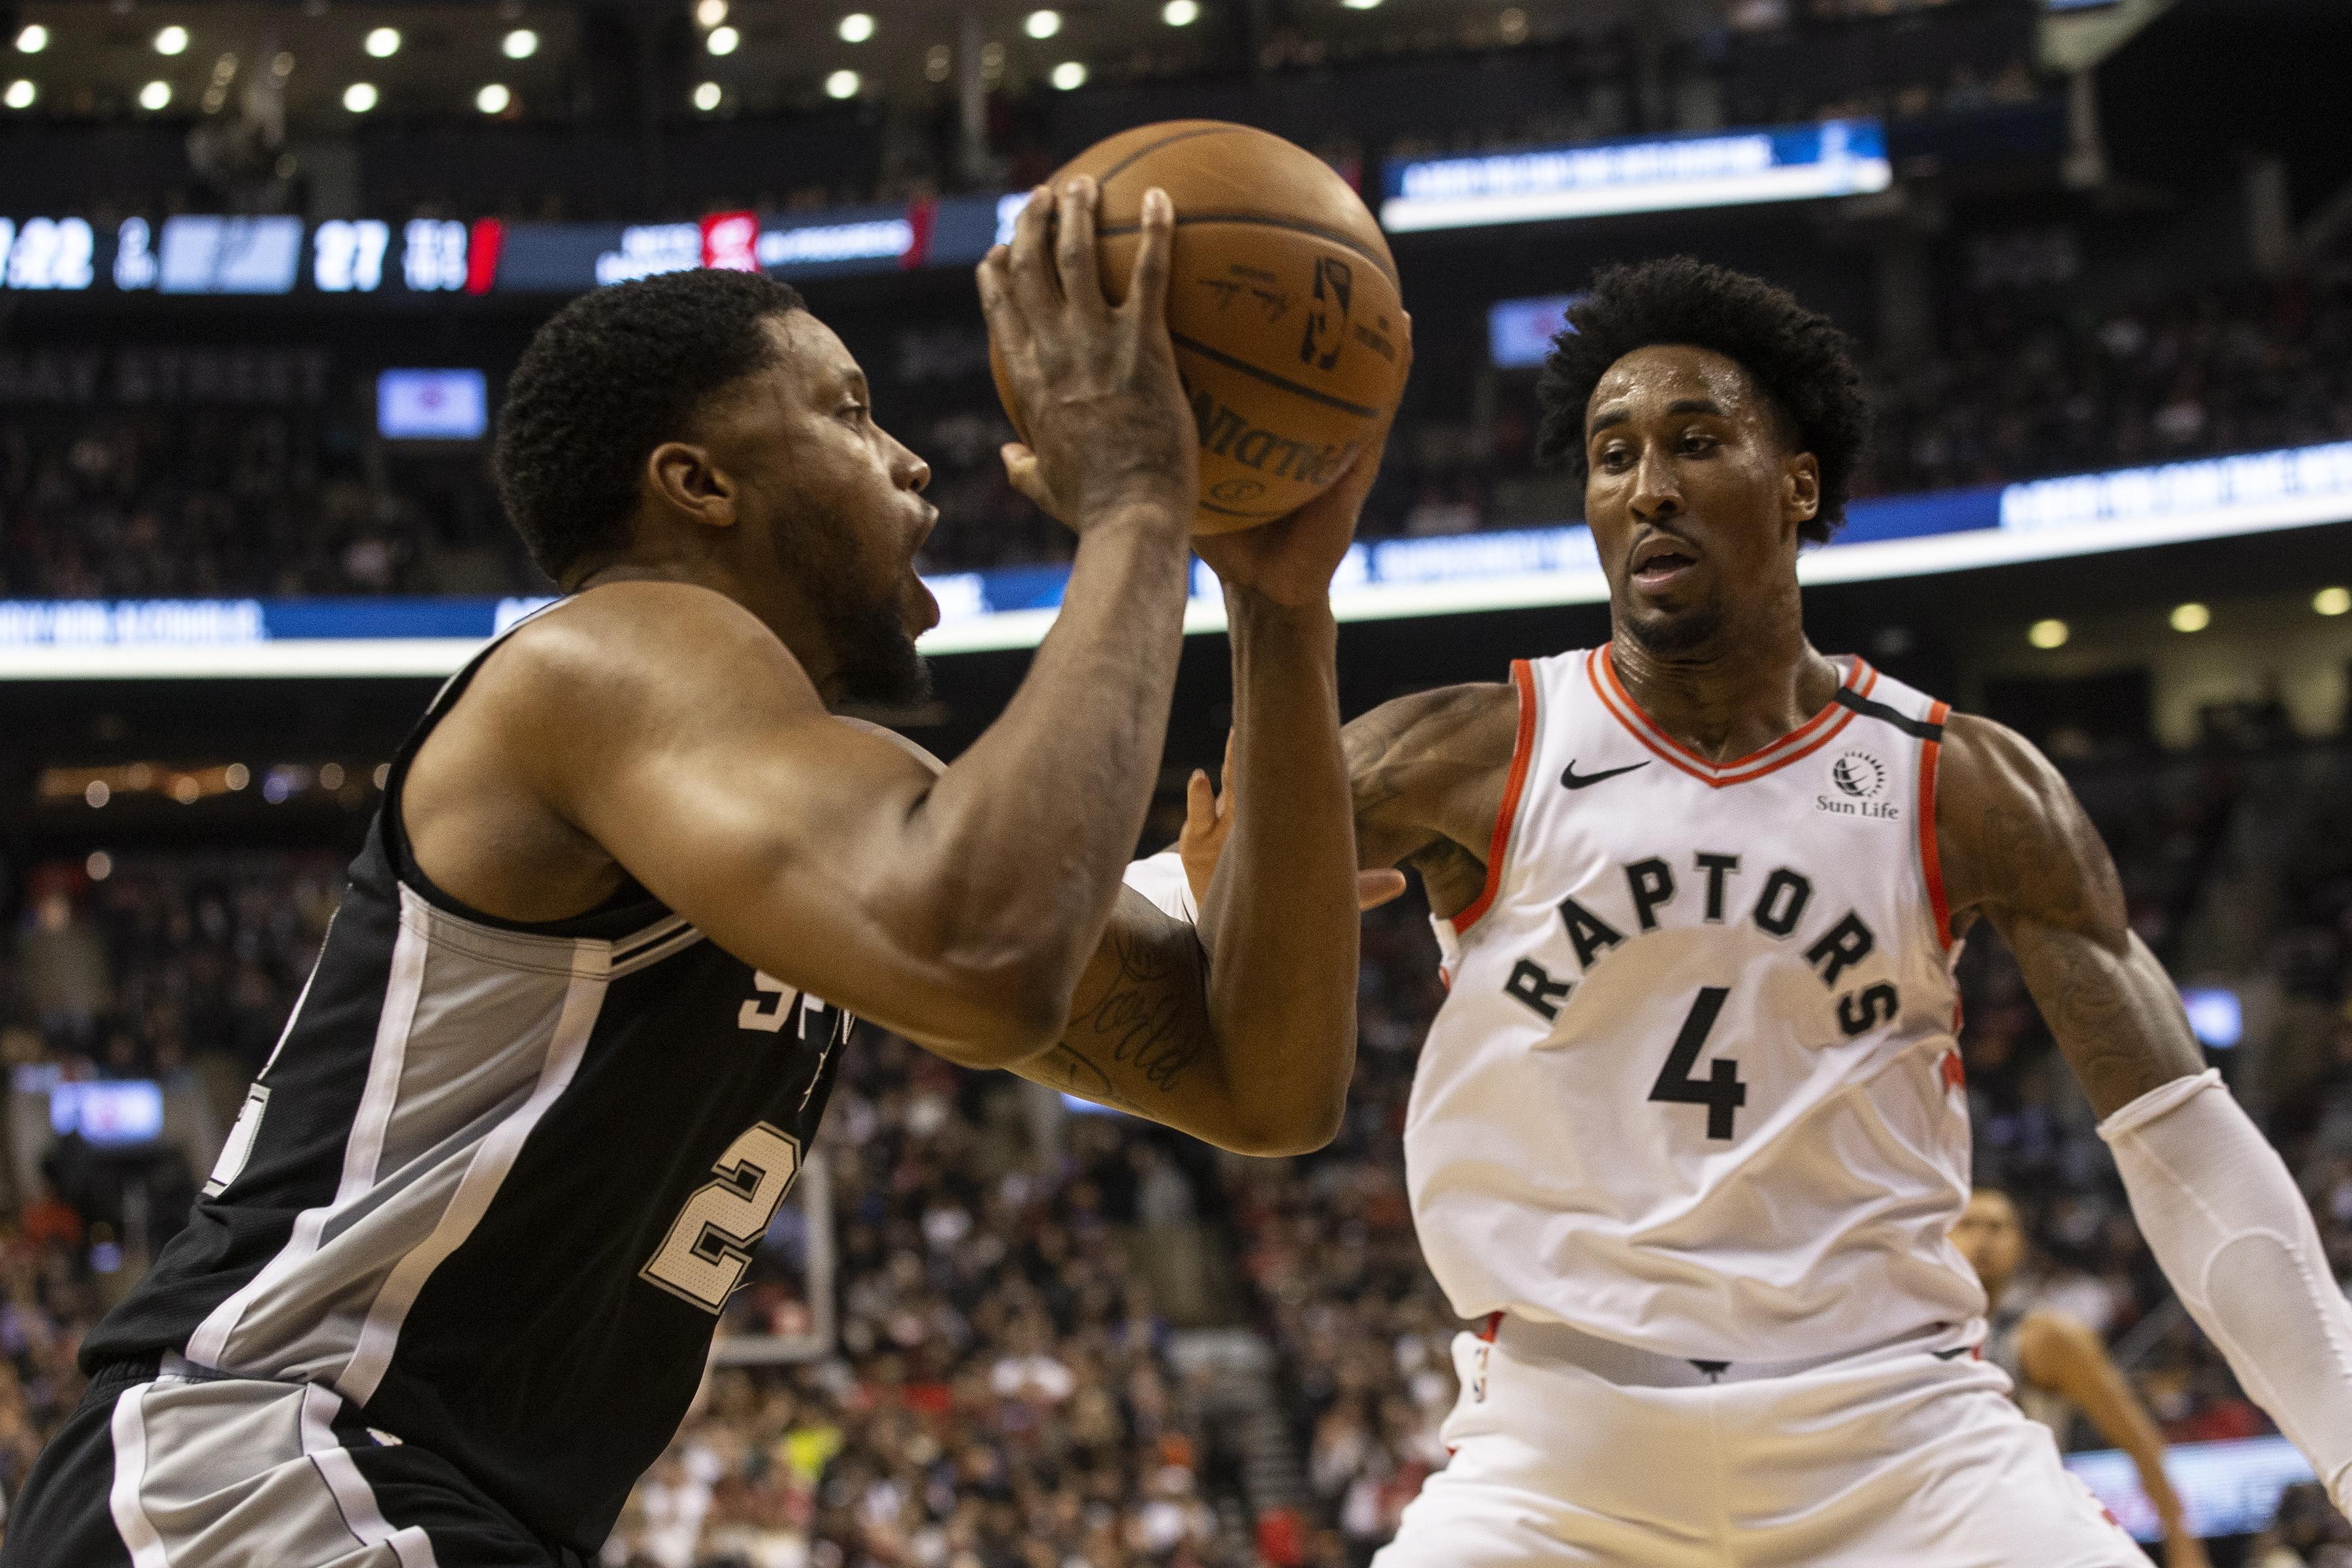 DeRozan scores 25, Spurs rally from 18 down, beat Raptors